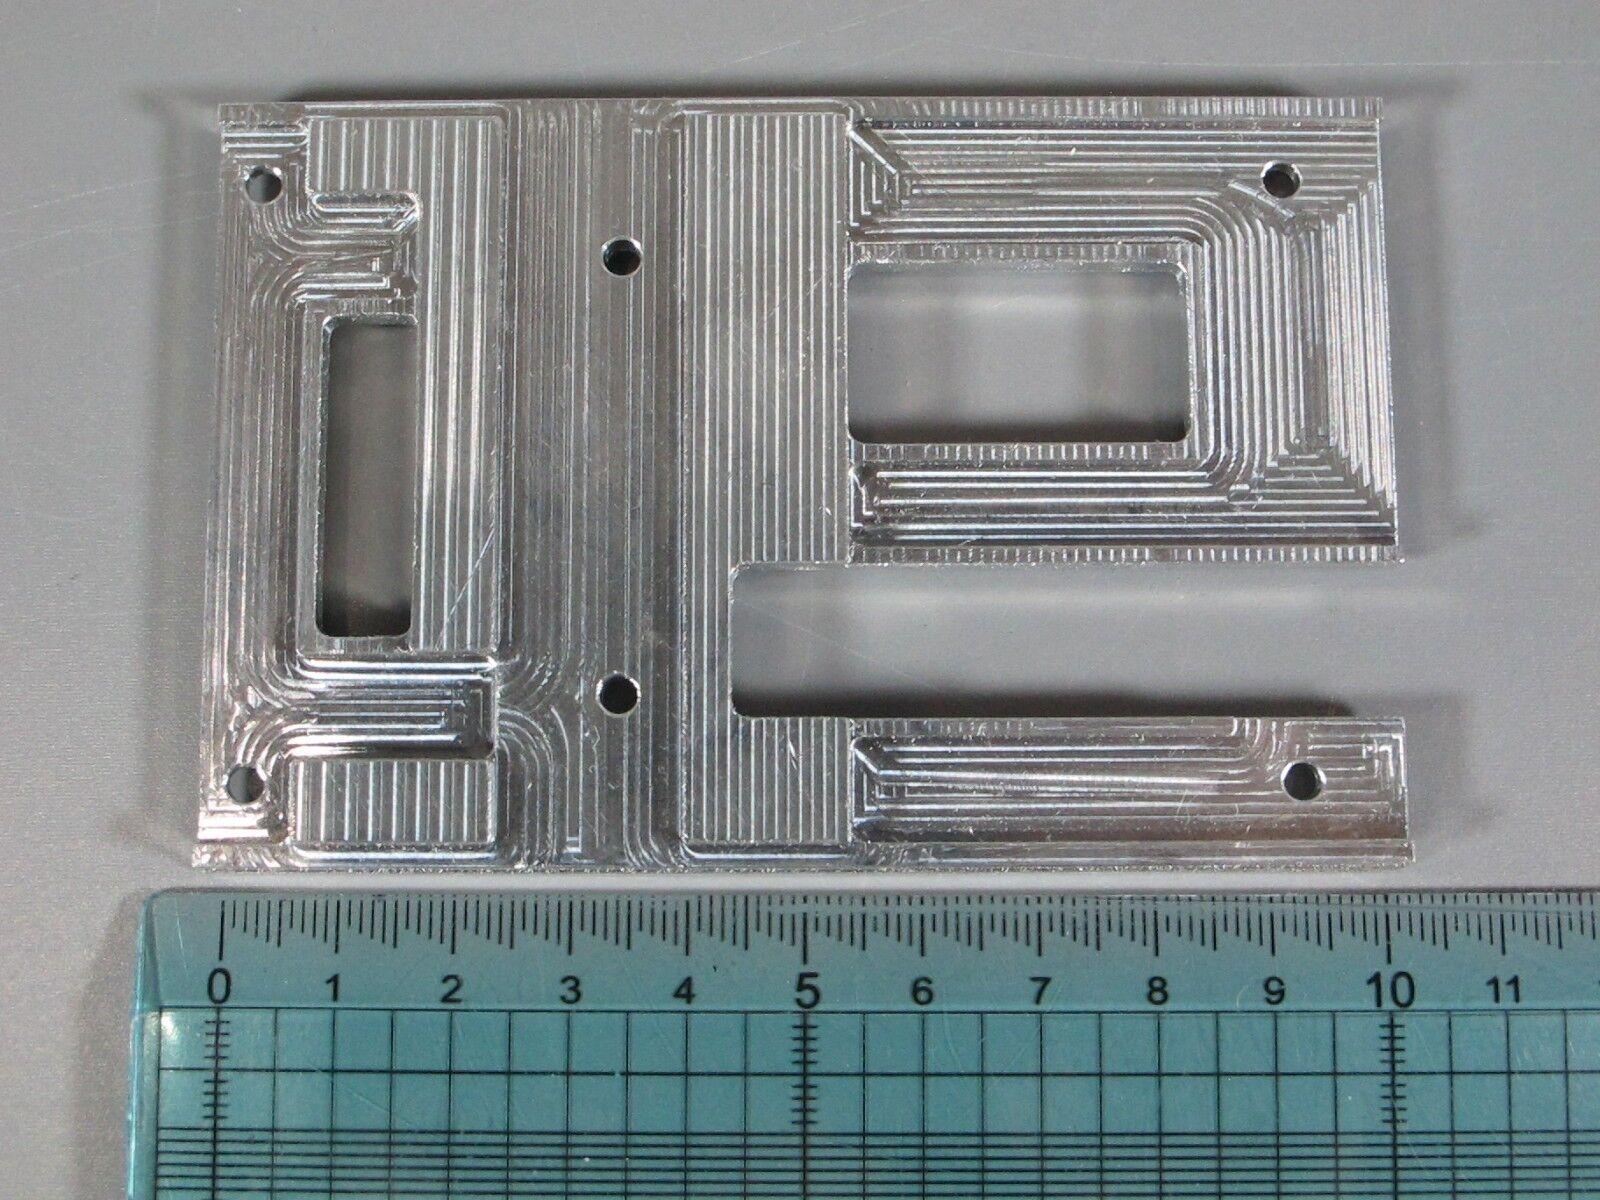 Aluminum Aluminum Aluminum 5th Rueda Coupling + Servo Mount Plate Tamiya RC 1 14 re Gre Hauler 4b1bcf